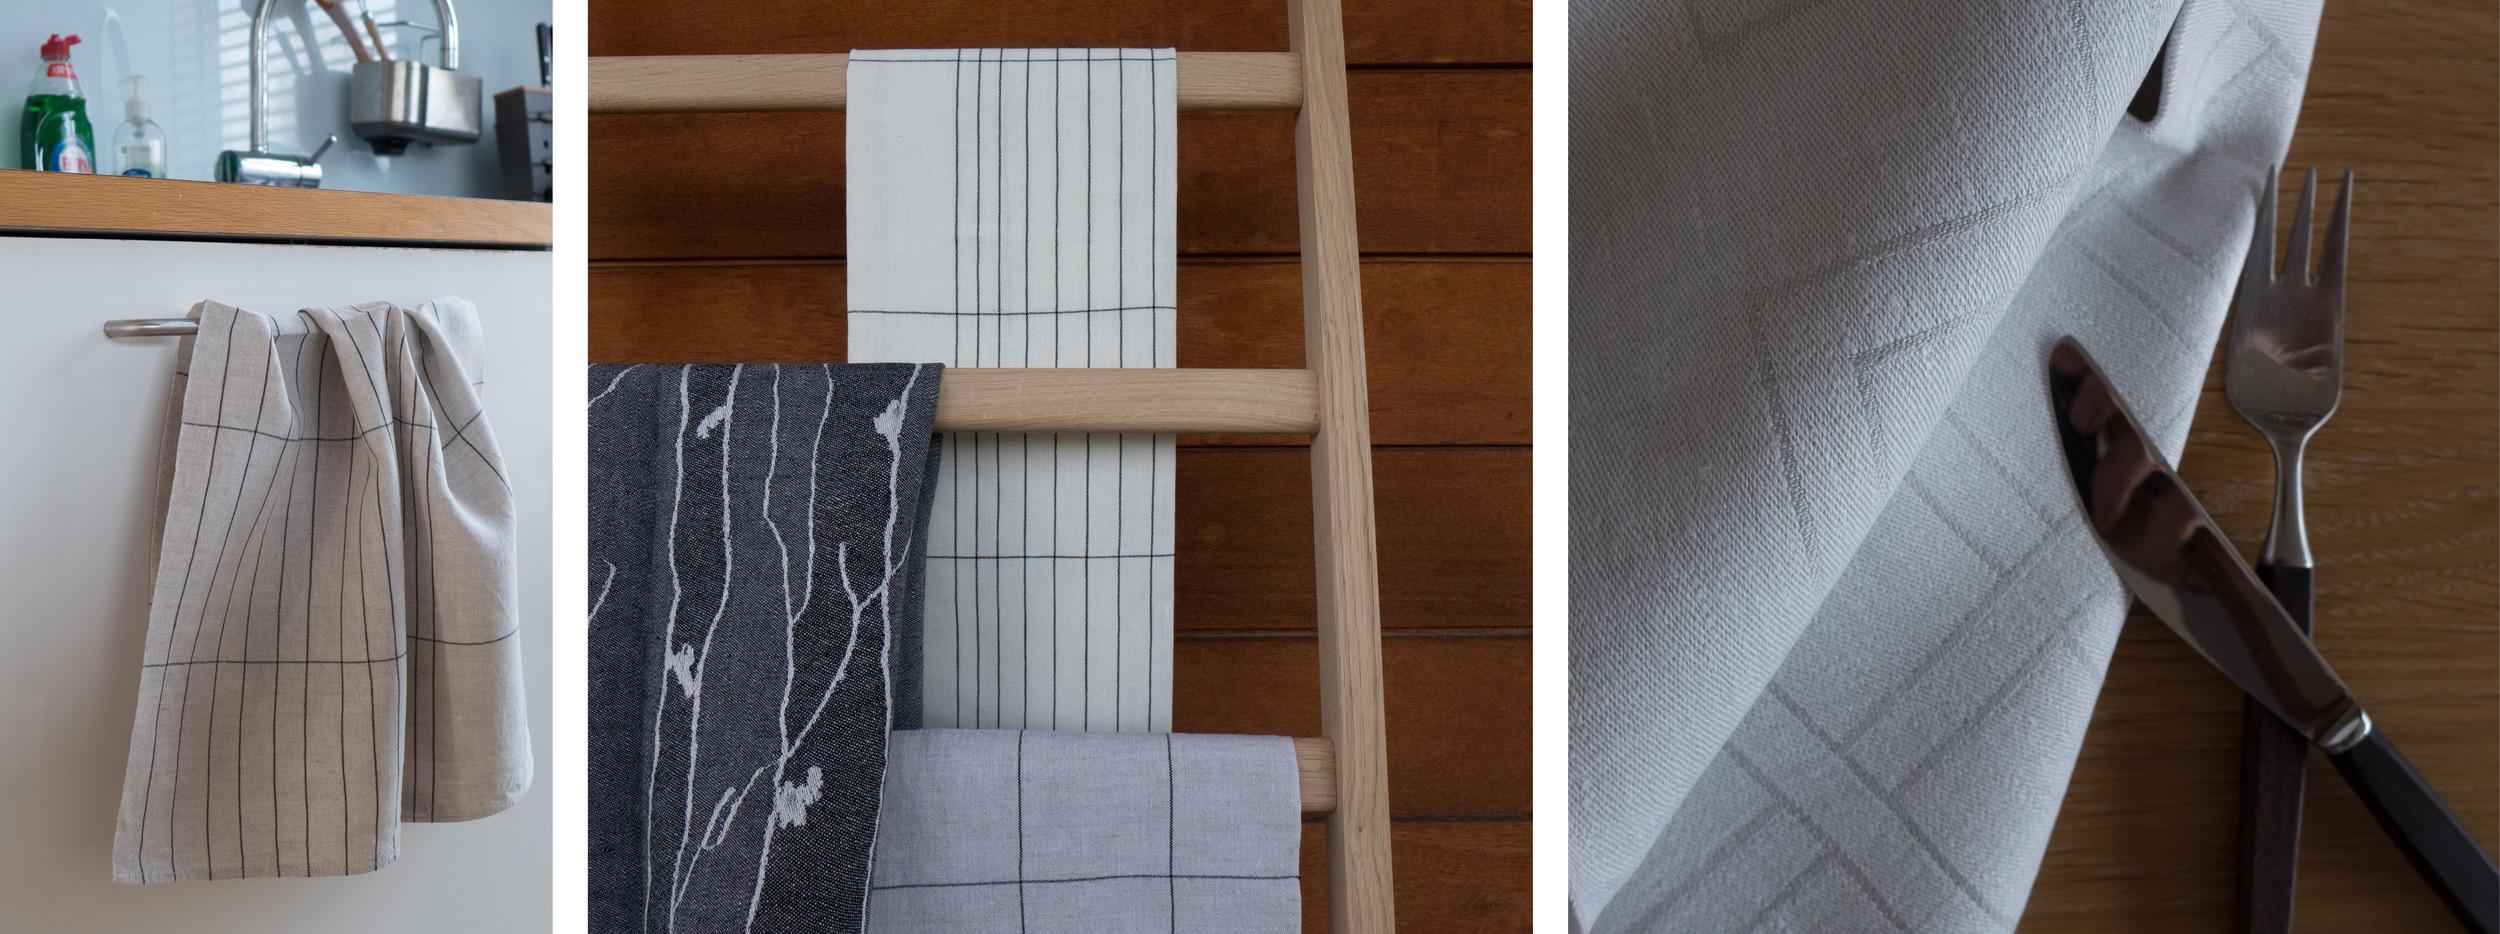 Manhattan tea towel in natural  Bjork and Manhattan in white and natural  Flätan napkin